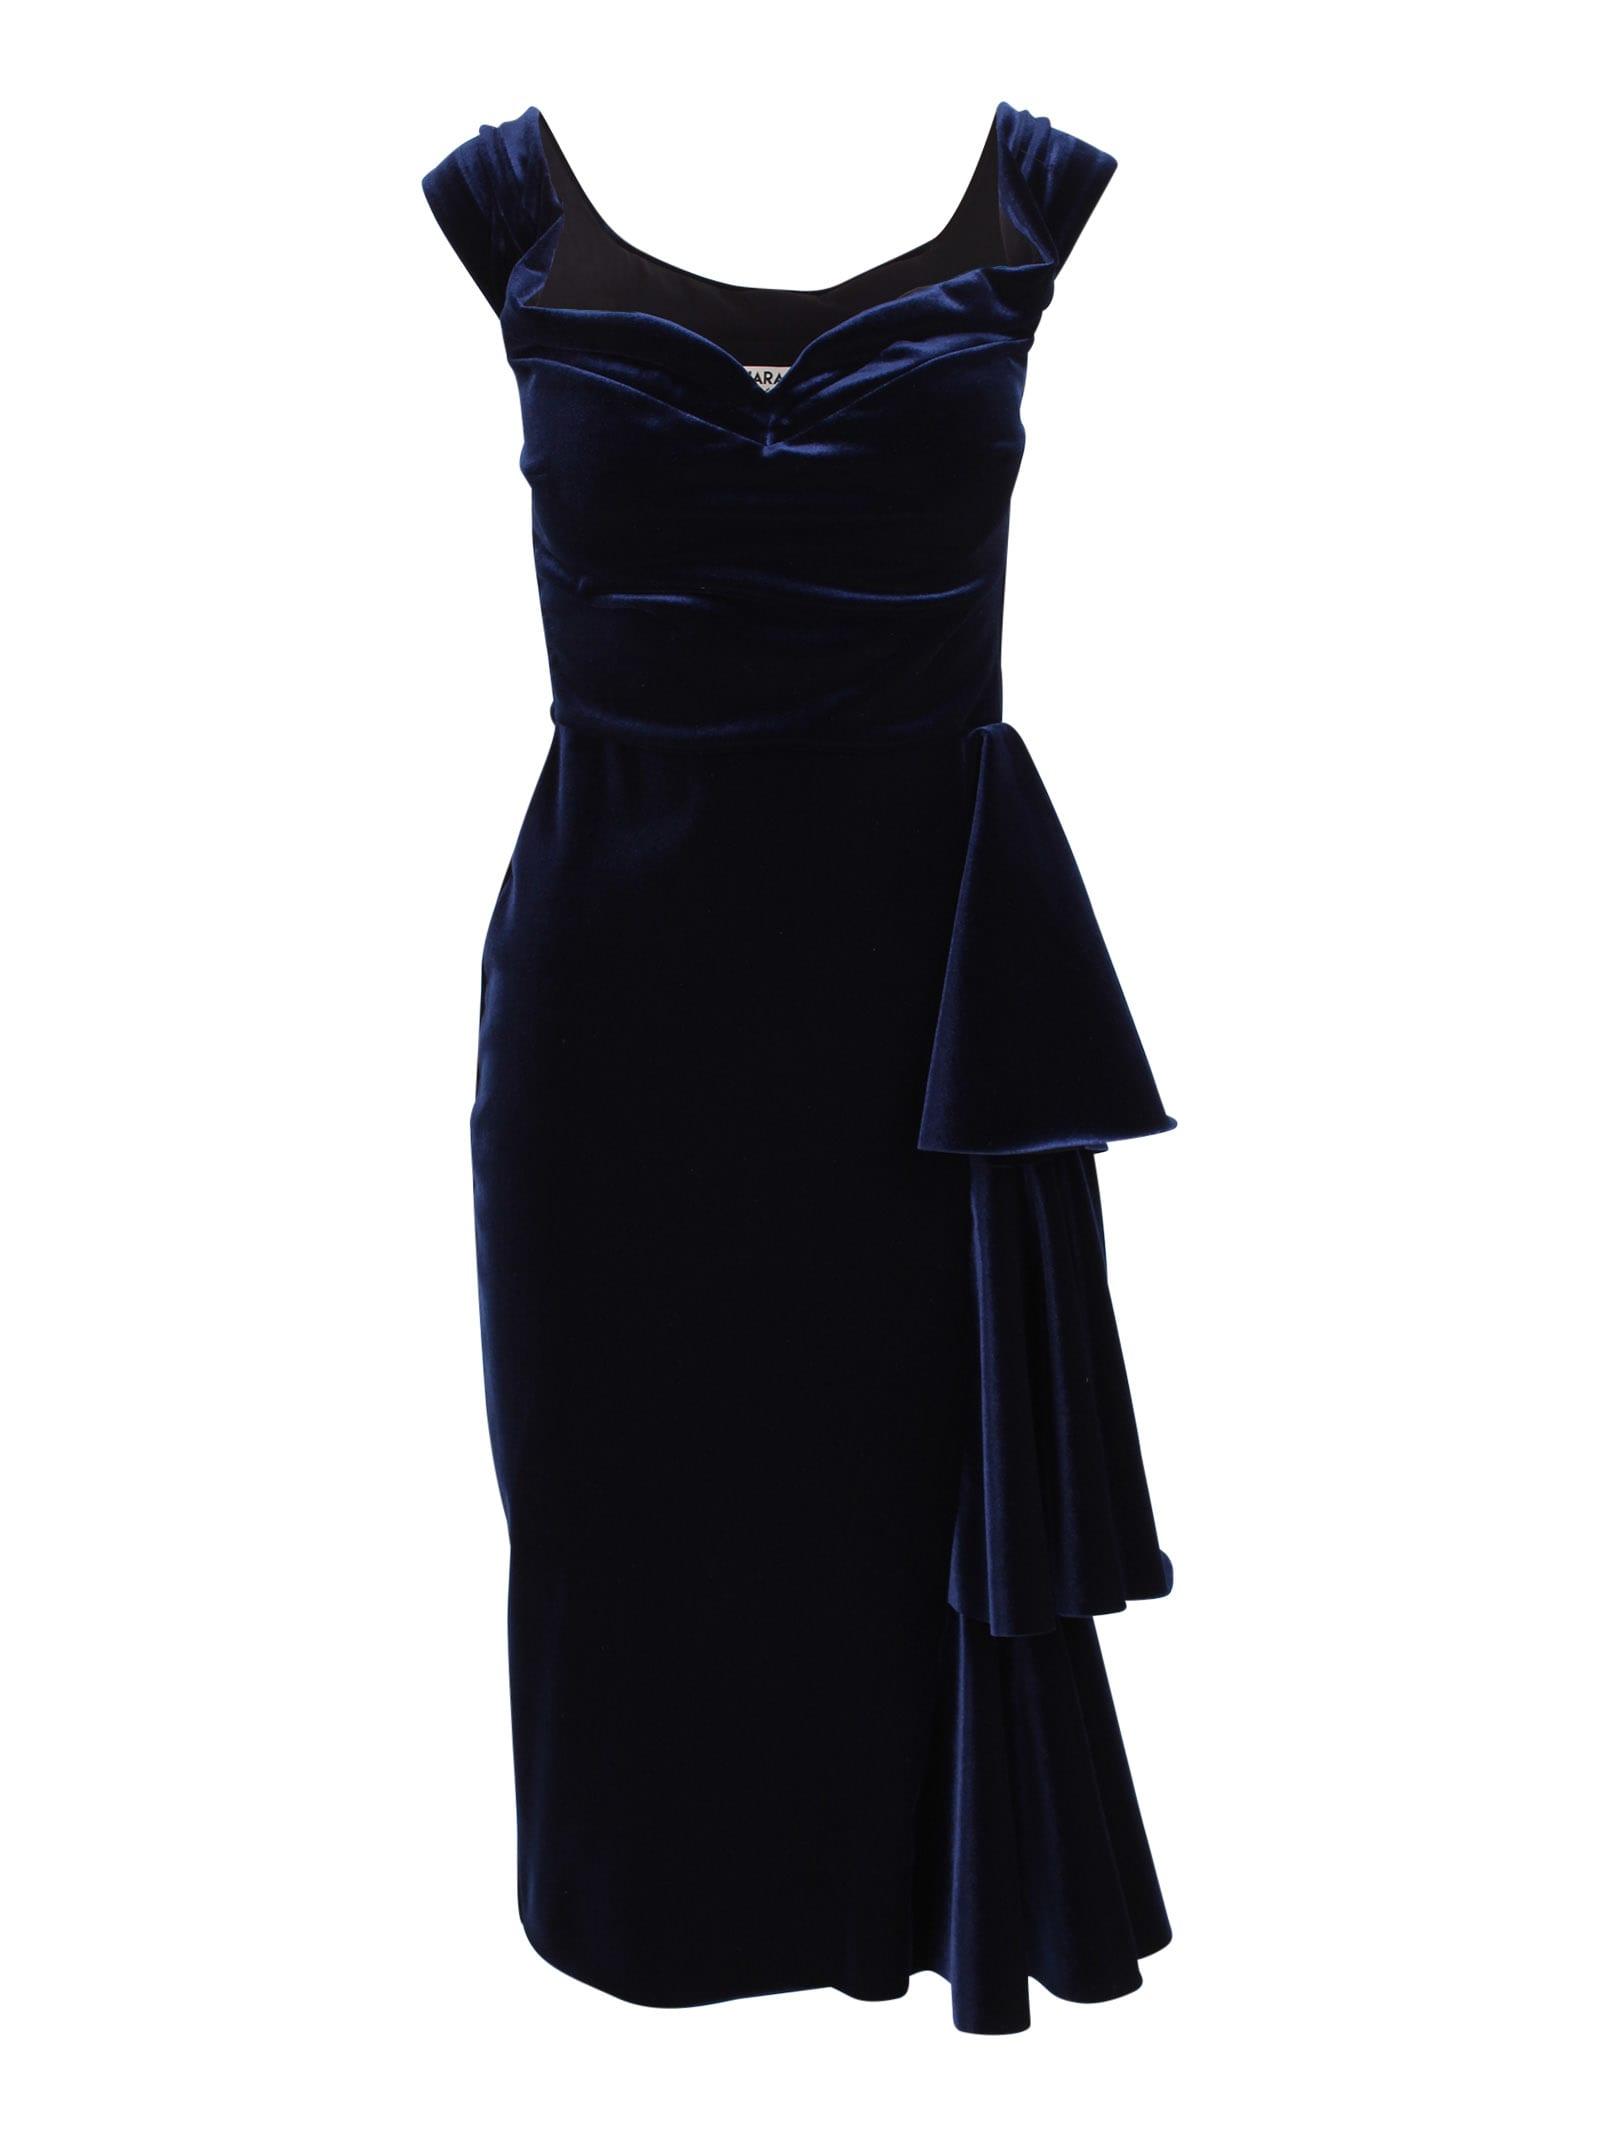 Le Petite Robe Di Chiara Boni willa Polyester Dress With Ruffles